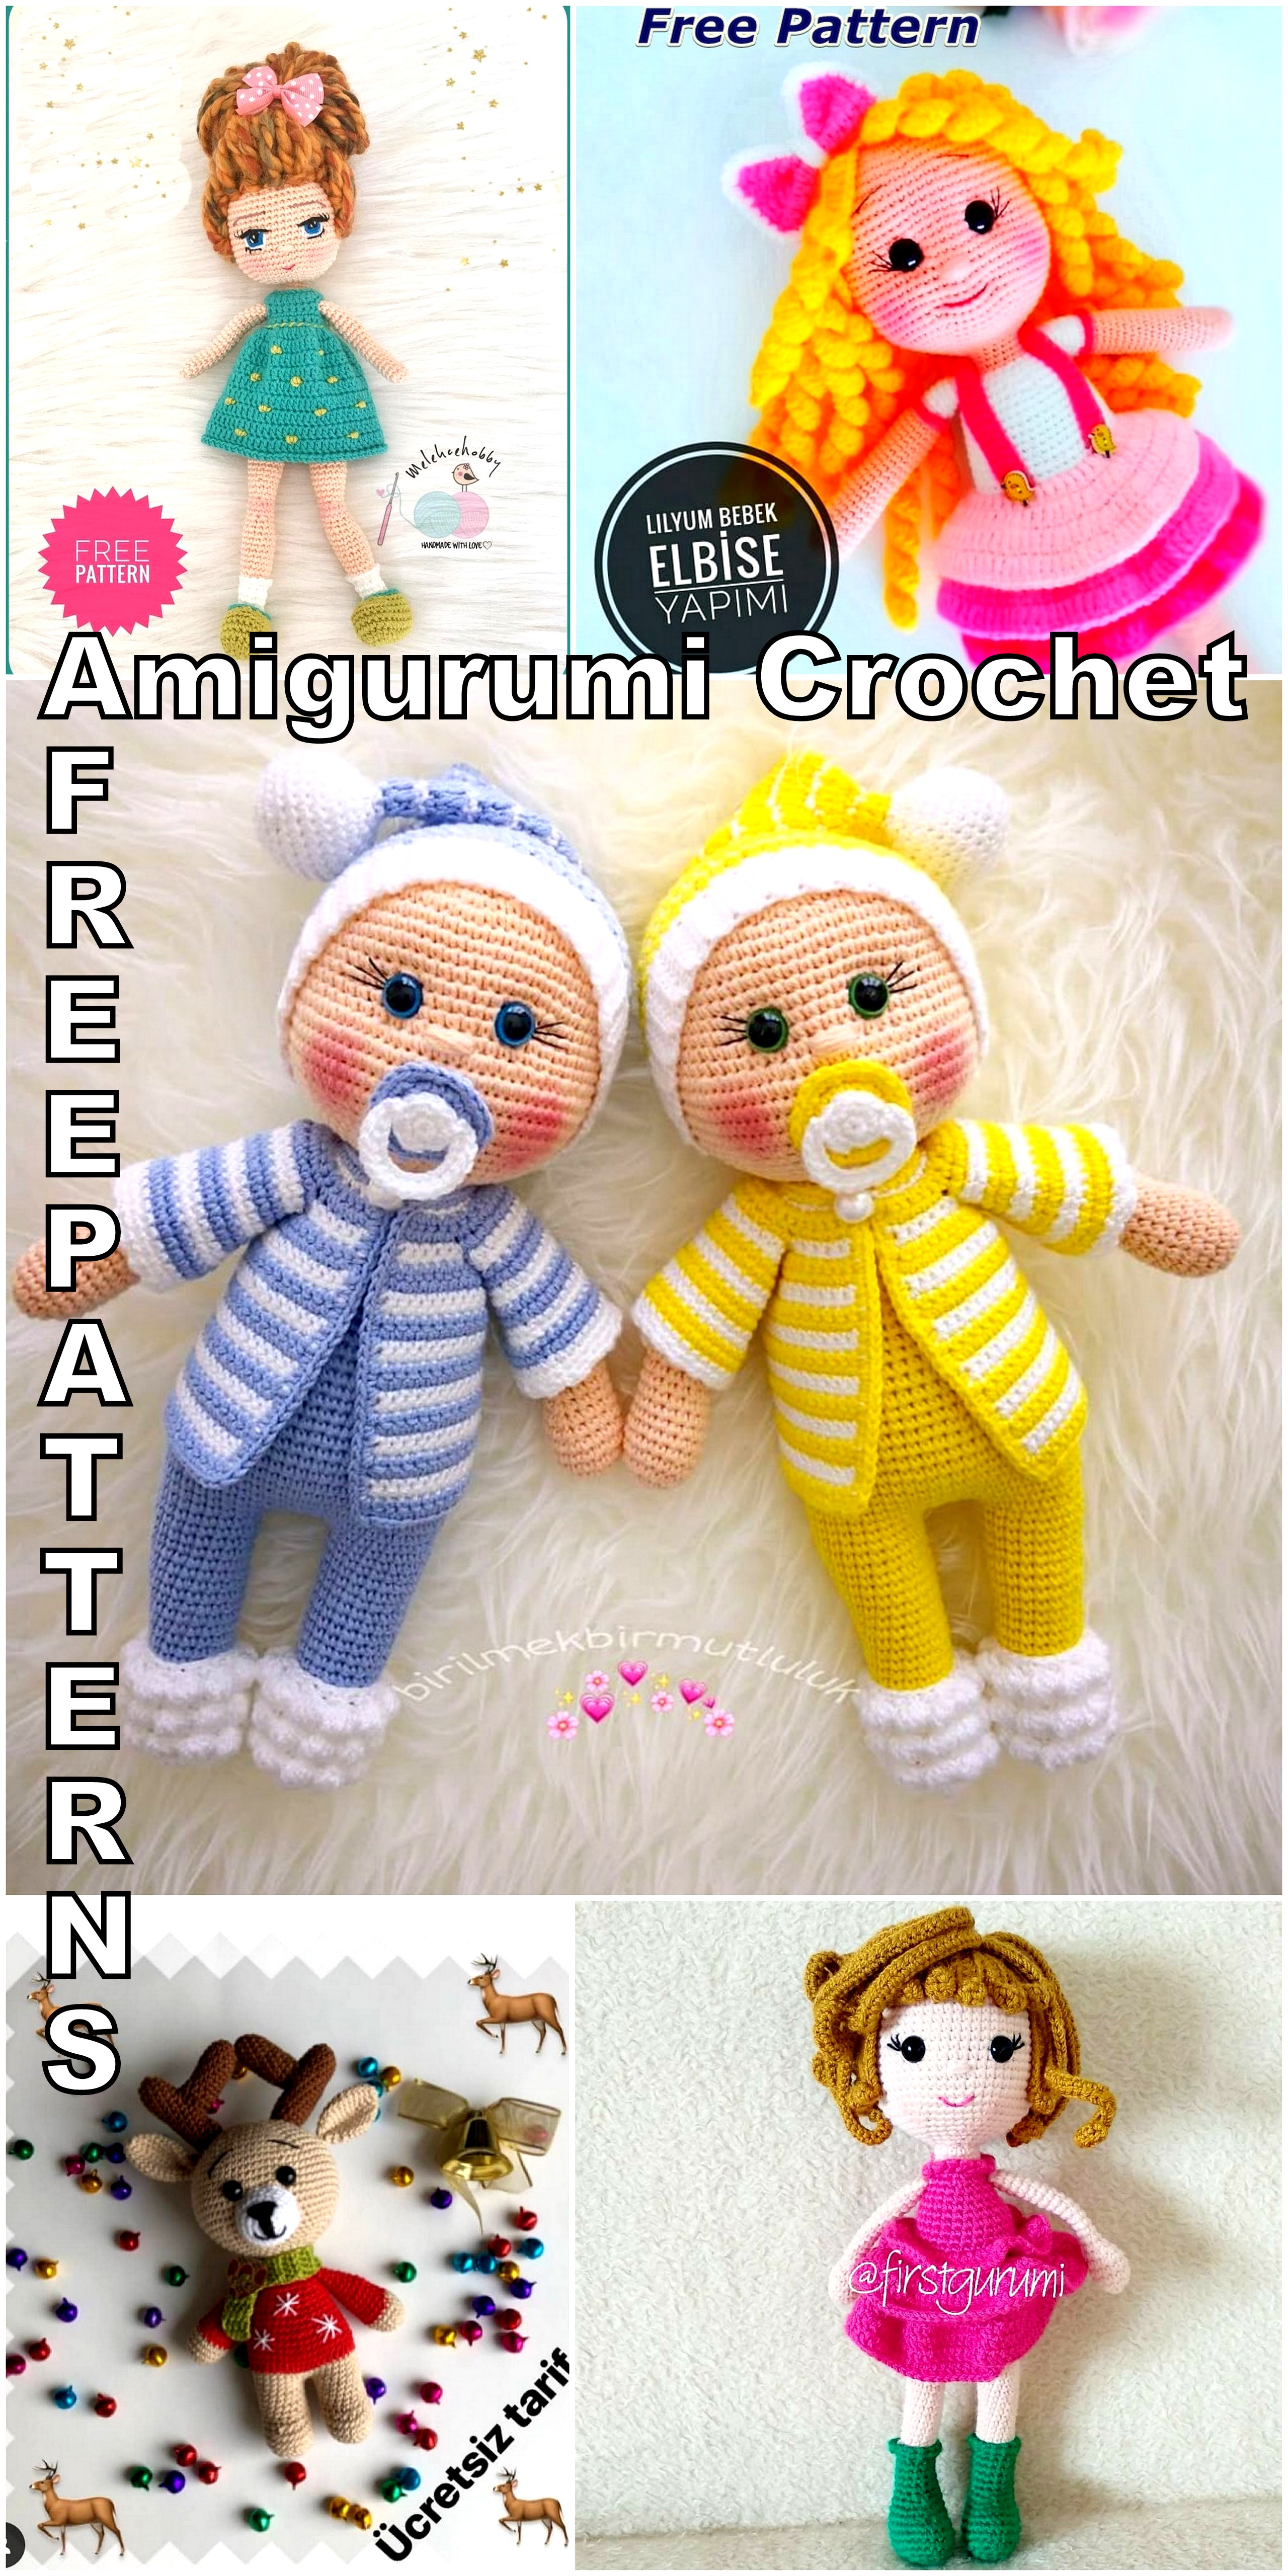 Best Amigurumi Doll And Animal Crochet Free Patterns